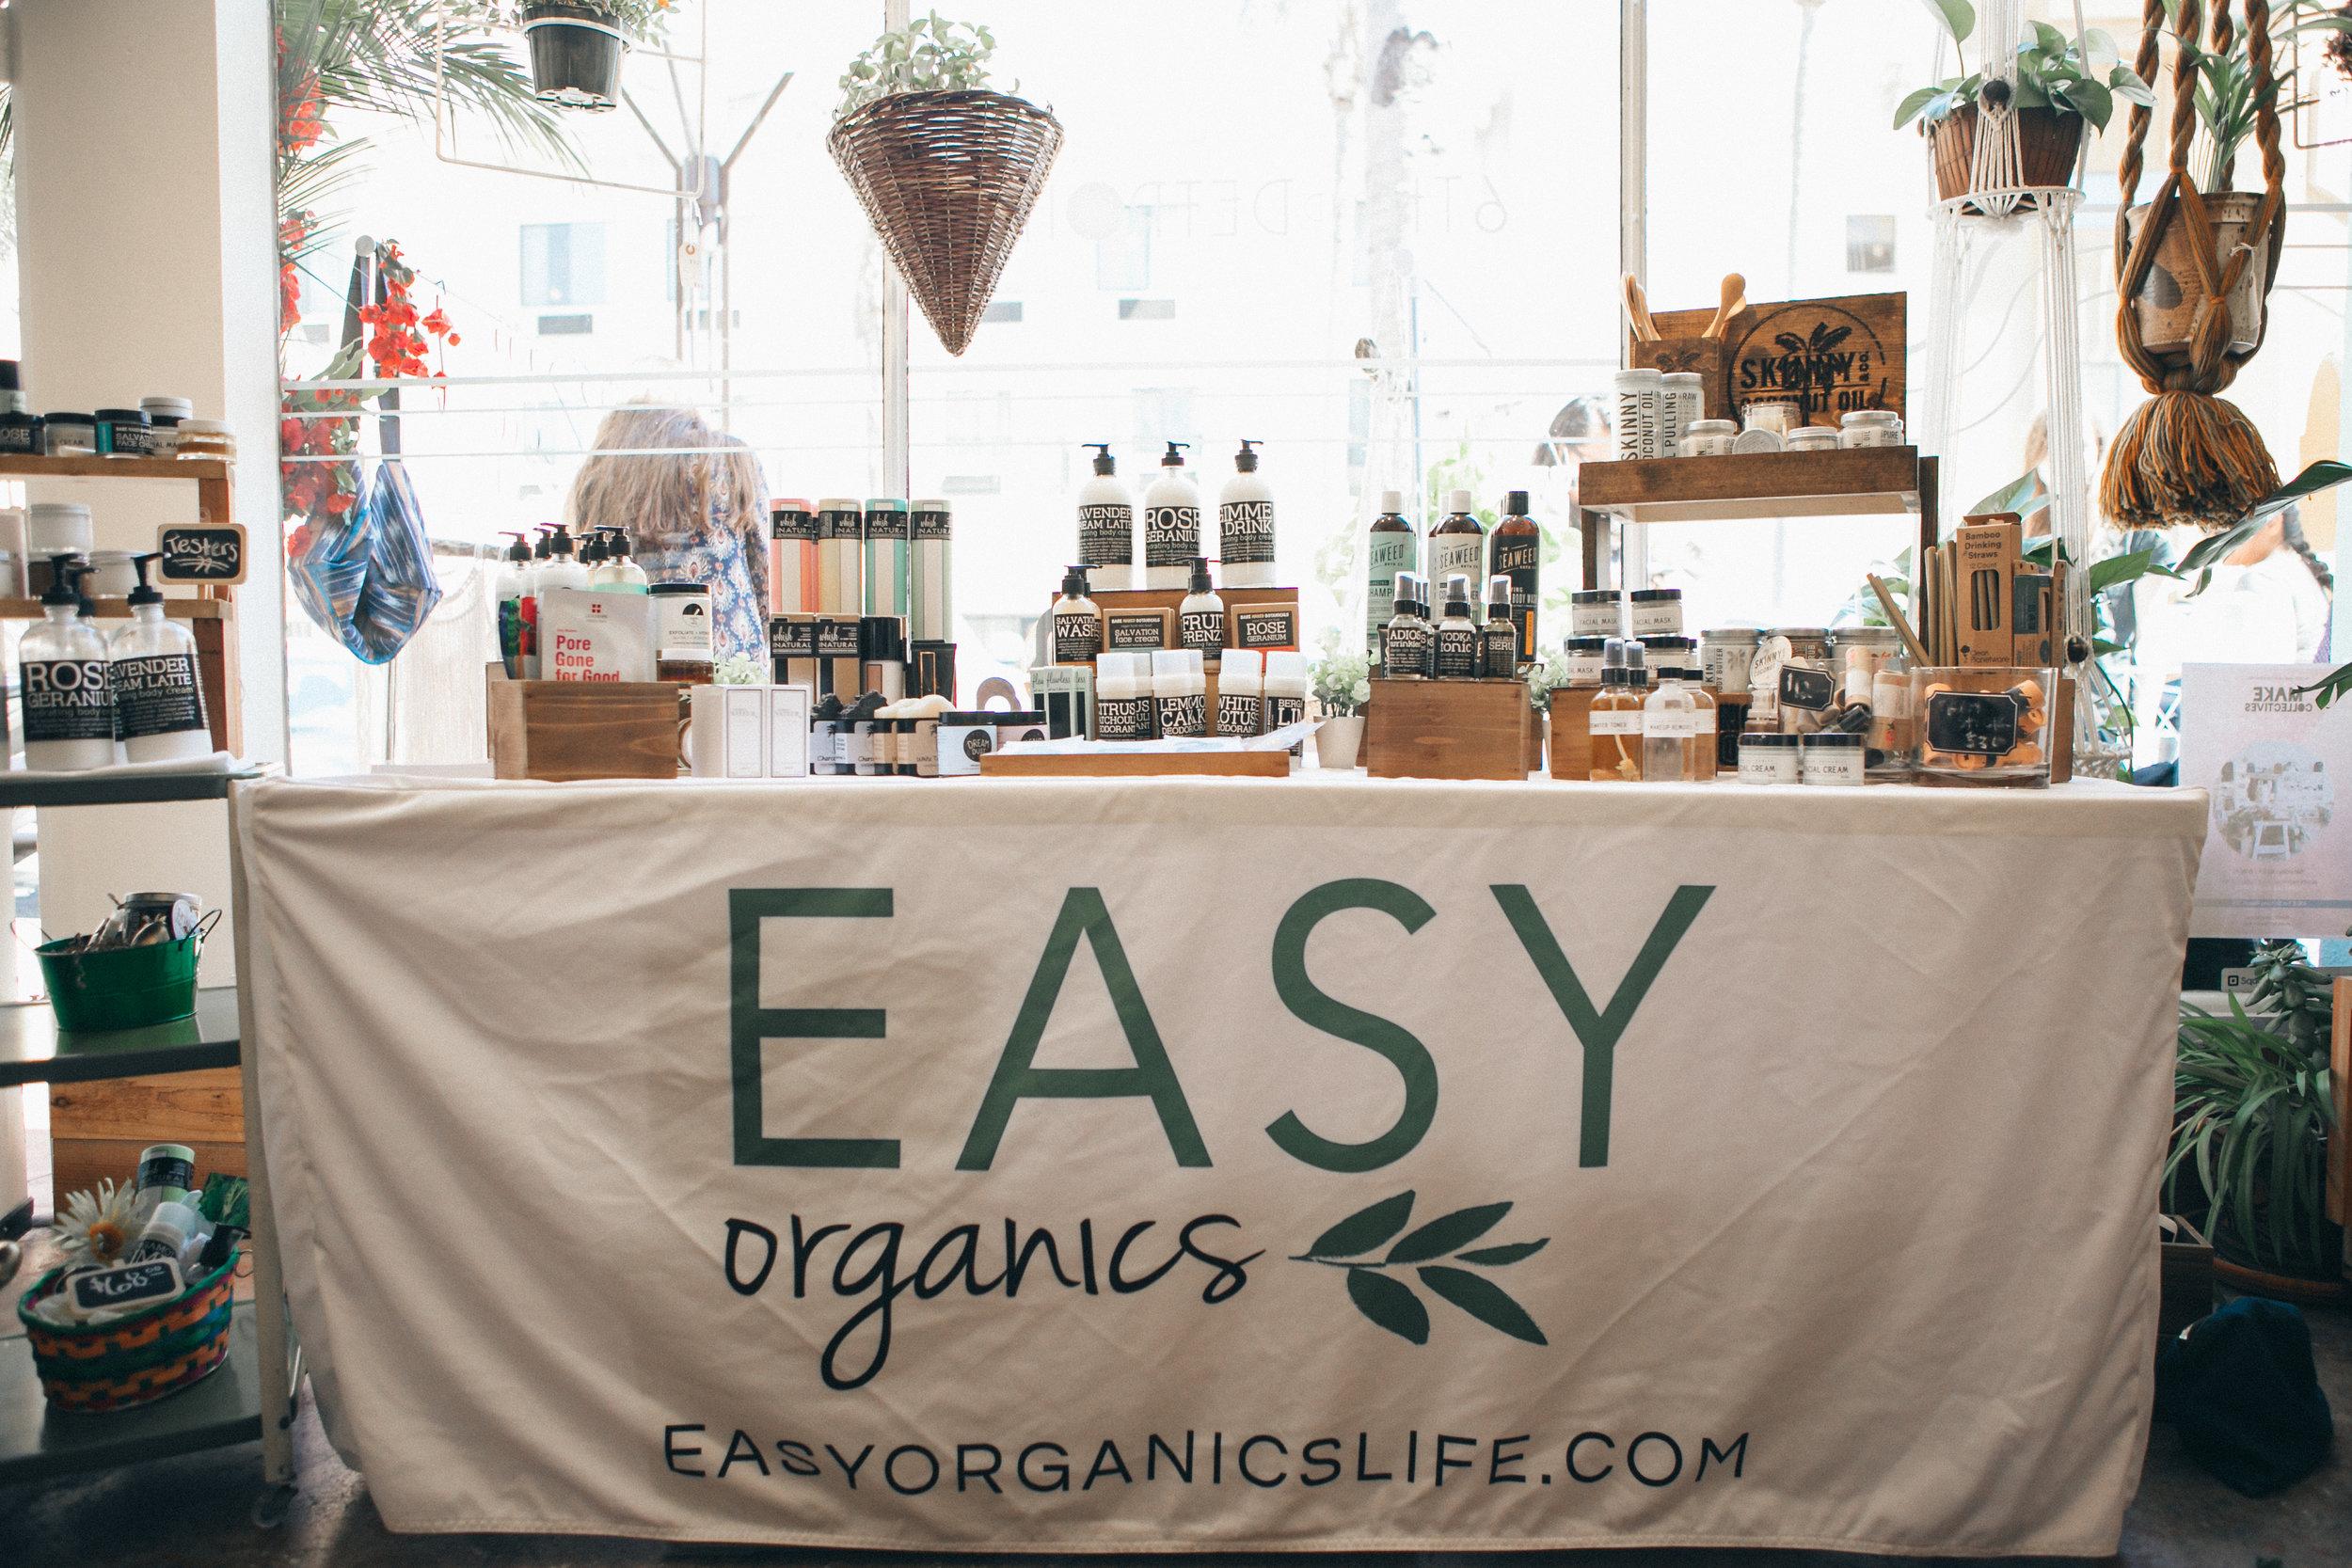 Easy Organics